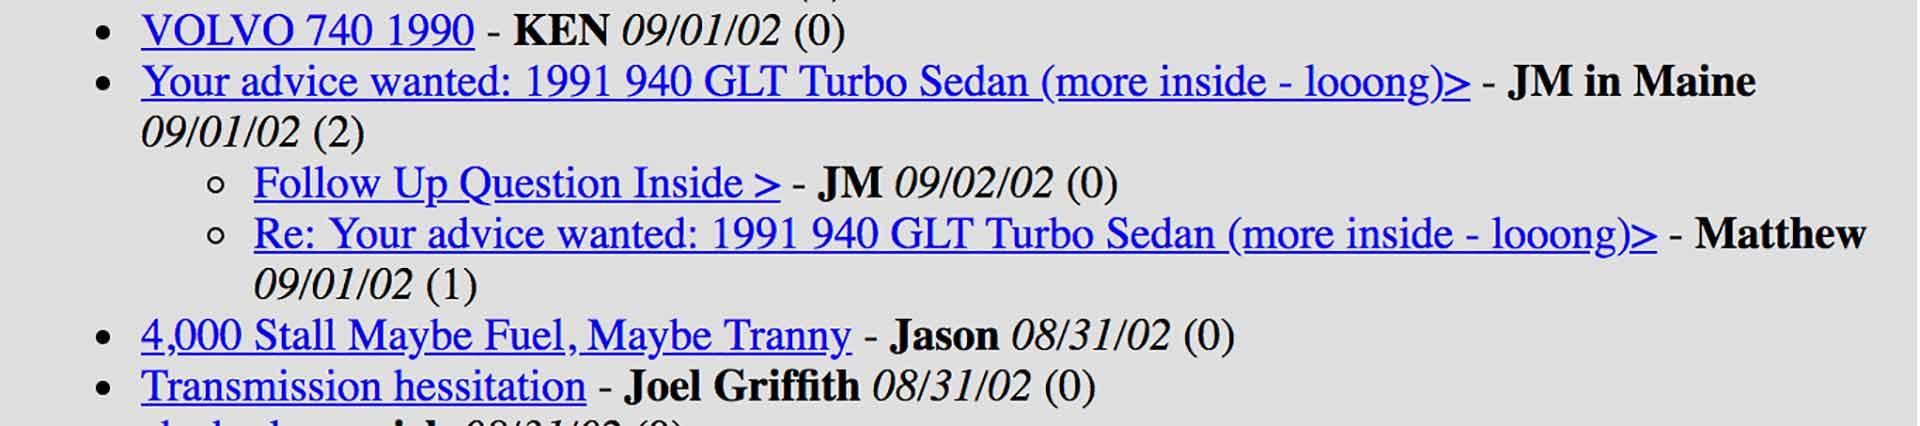 2002 Volvo Forum Questions2 -